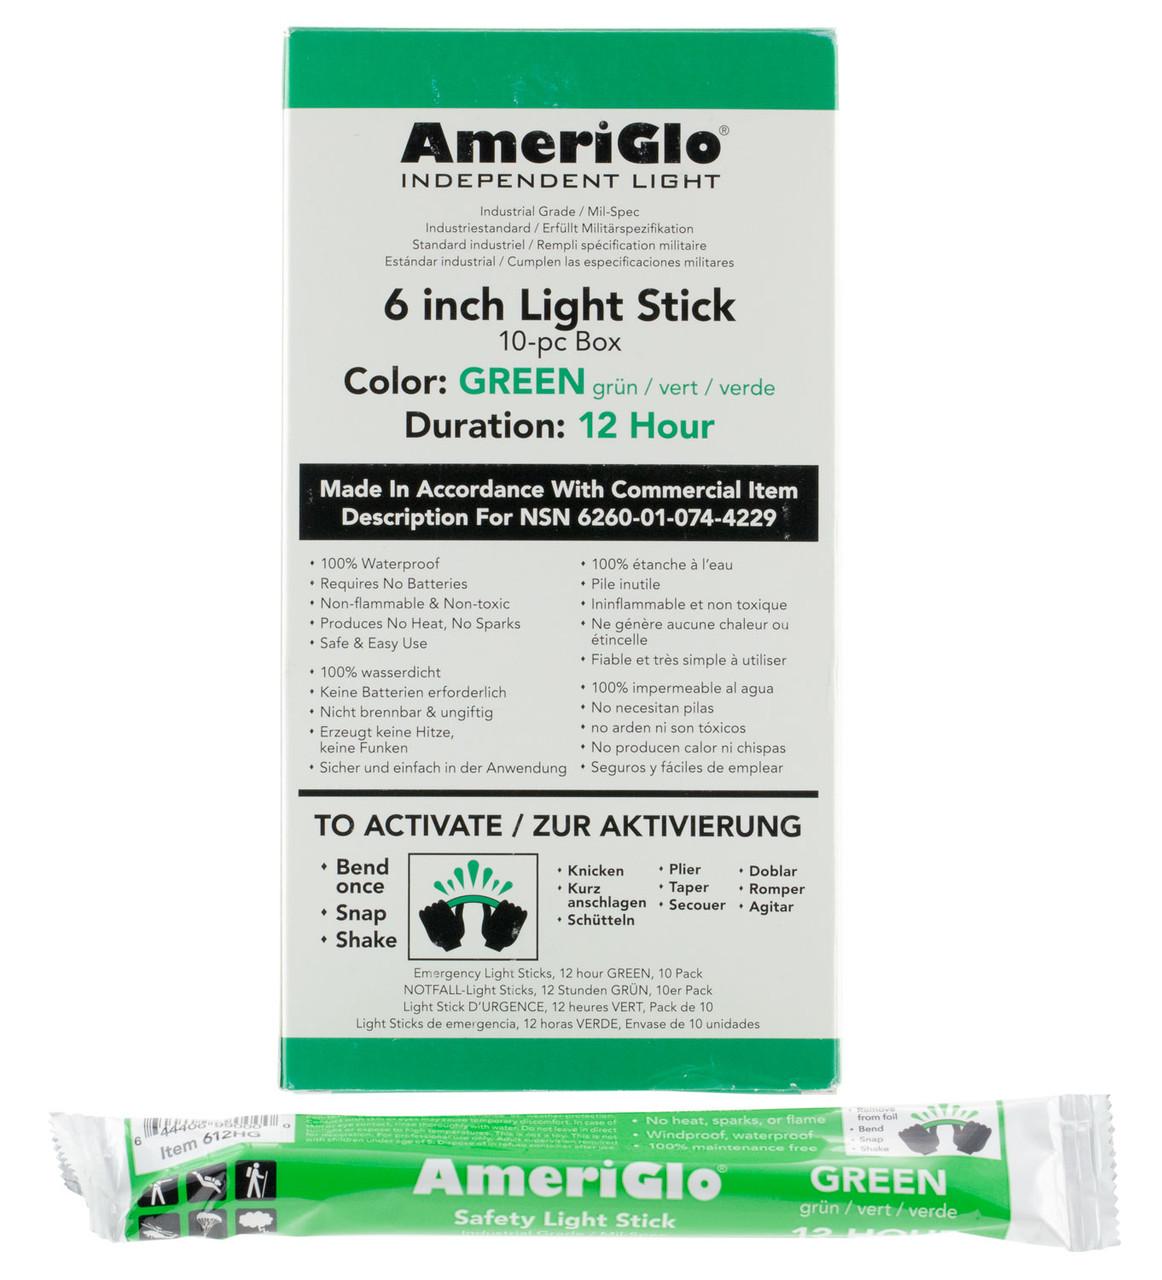 AmeriGlo light stick 10 count box,  12 hour green